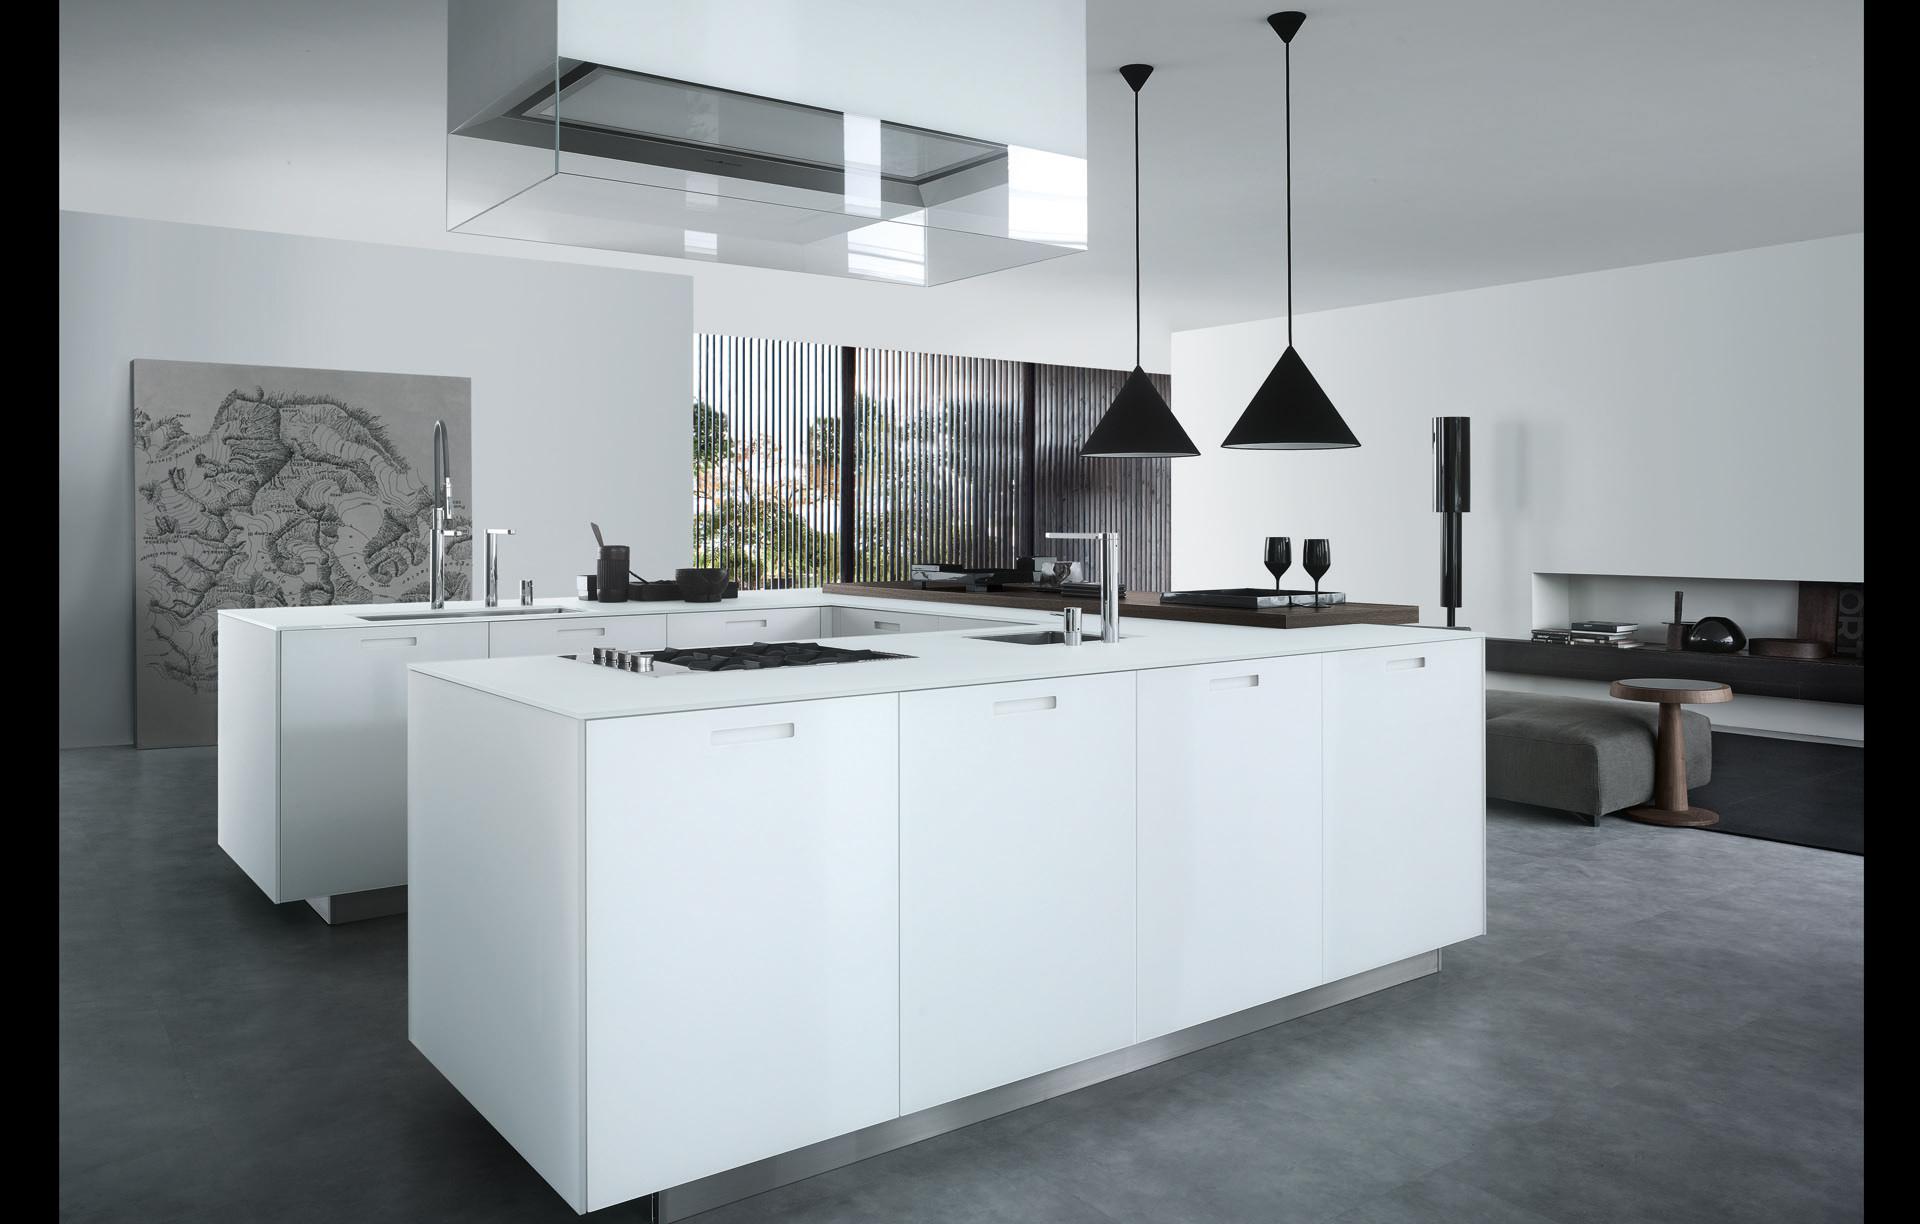 Kyton di varenna cucine arredamento mollura home design - Keuken varenna ...